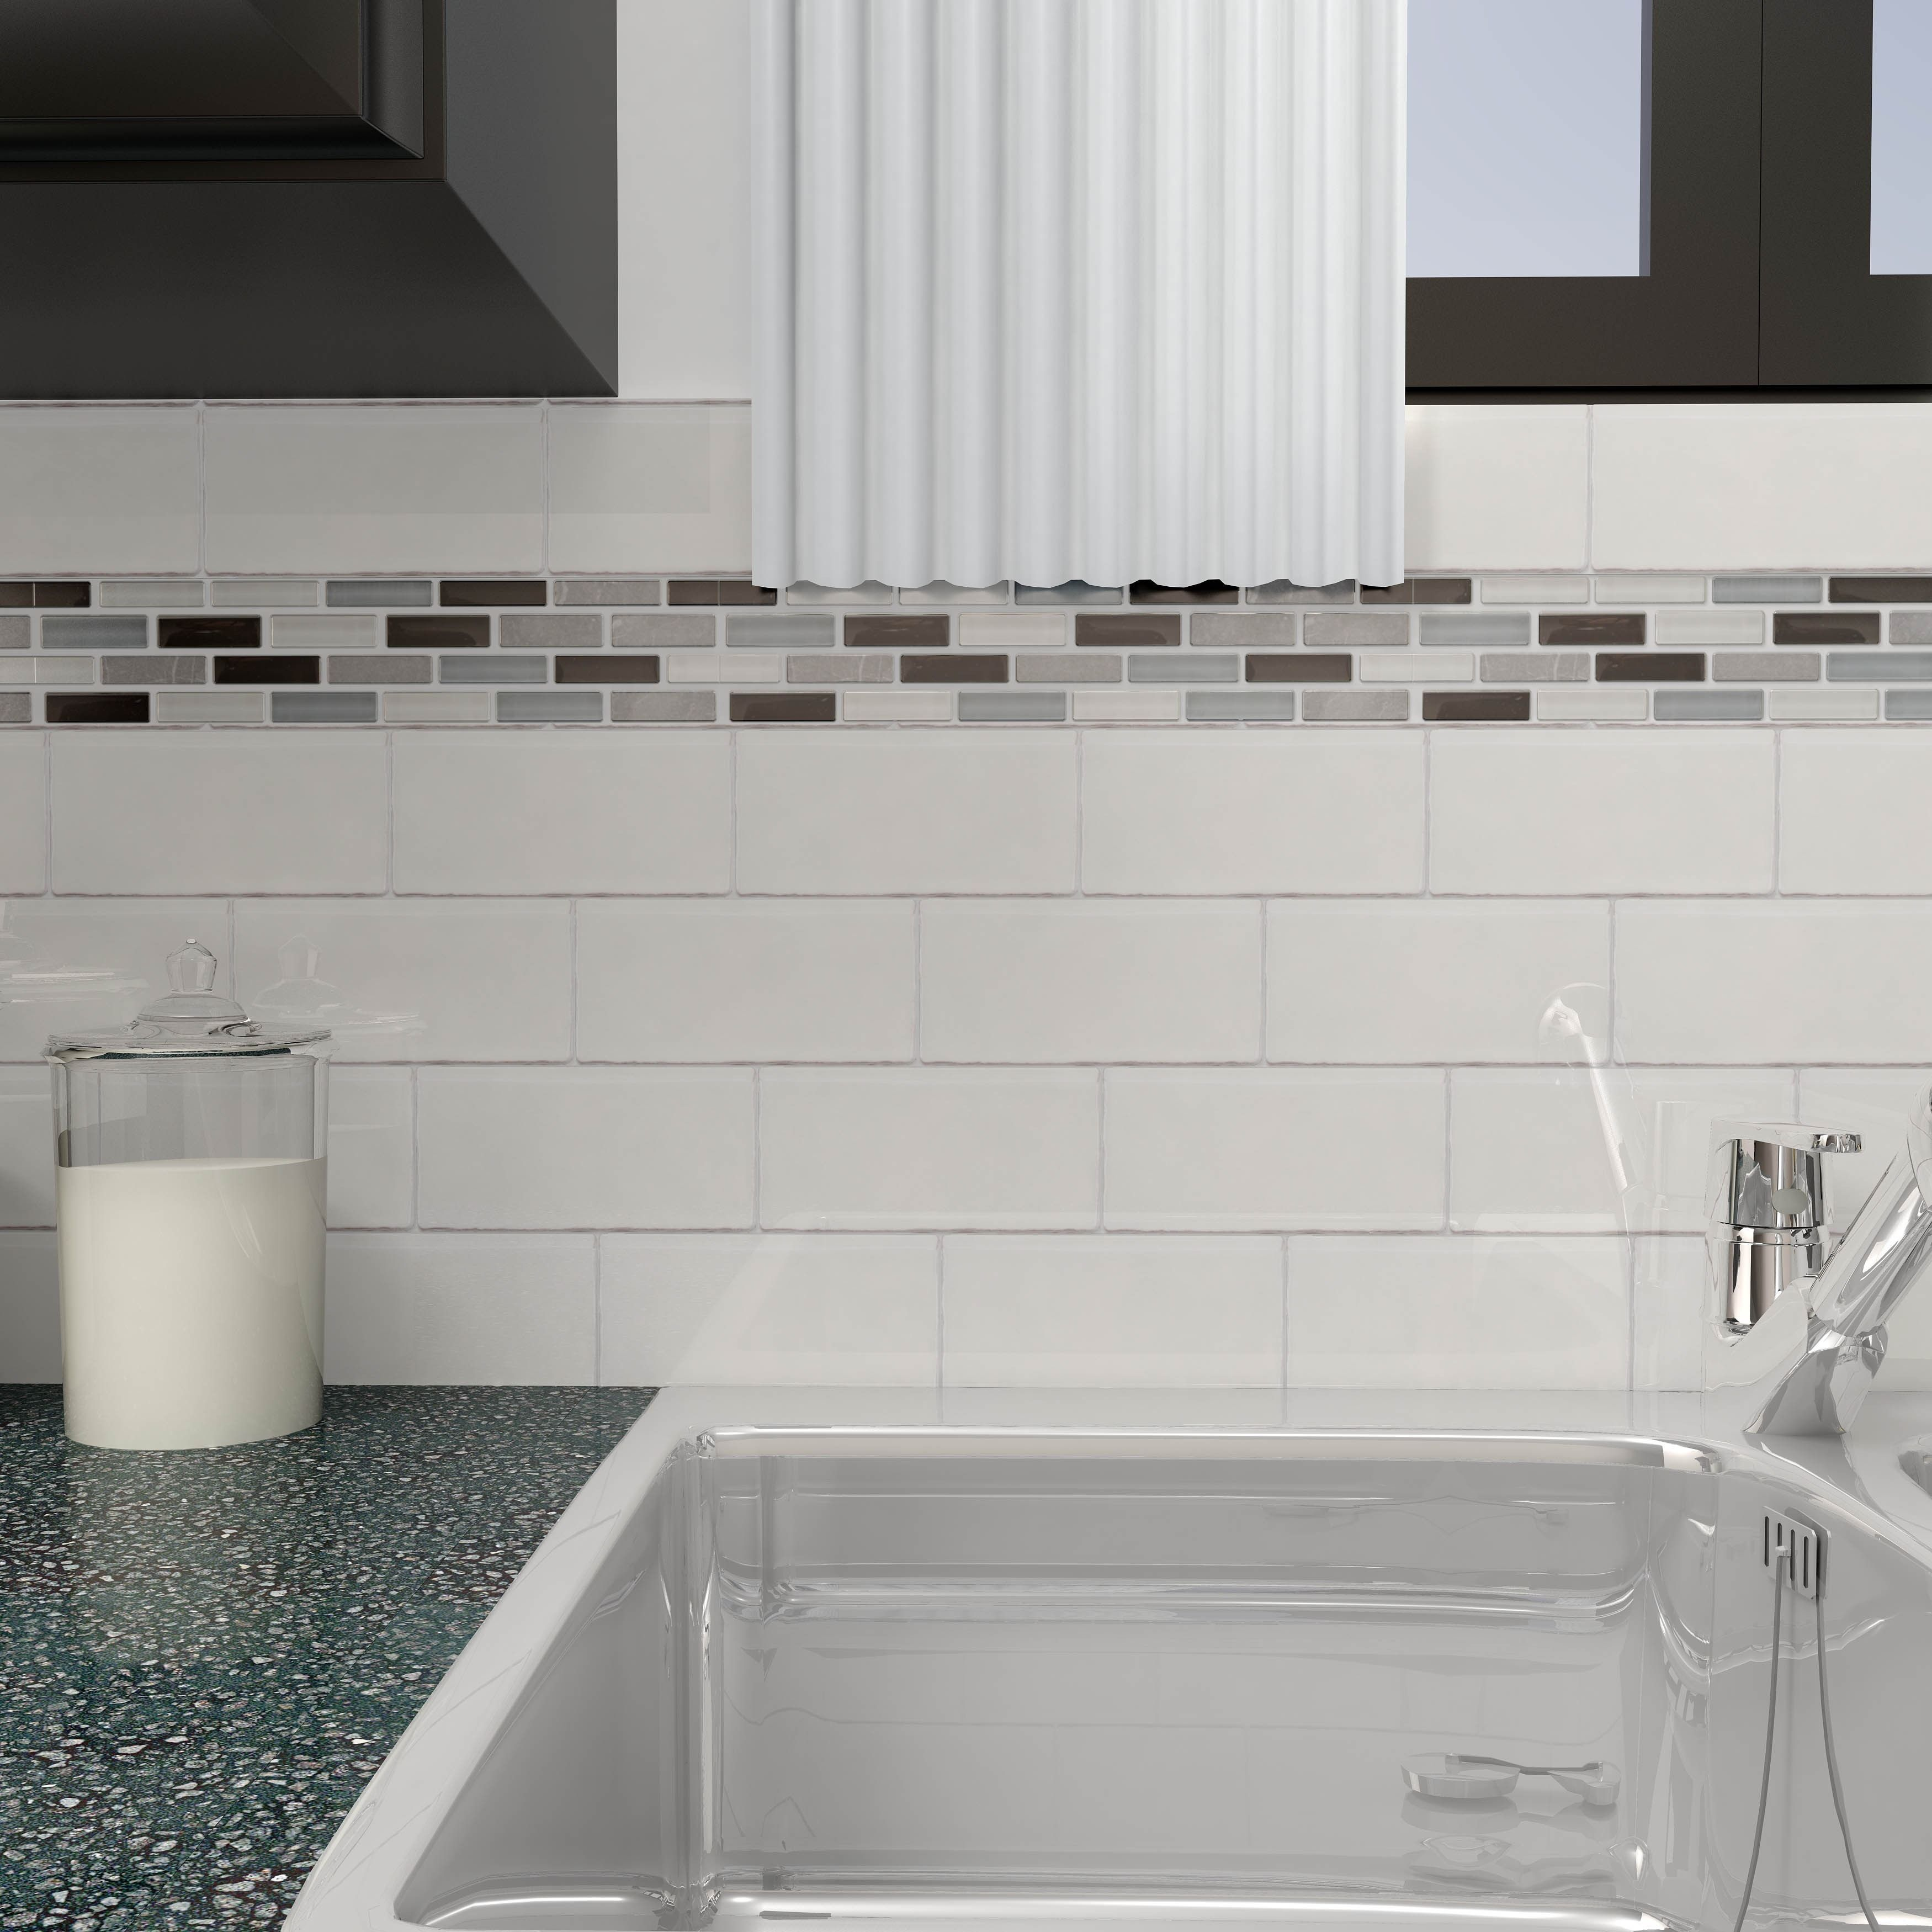 Somertile 3x6 Inch Gloucester Bianco Ceramic Wall Tile 16 Tiles 2 Sqft Wall Tiles Porcelain Wall Tile